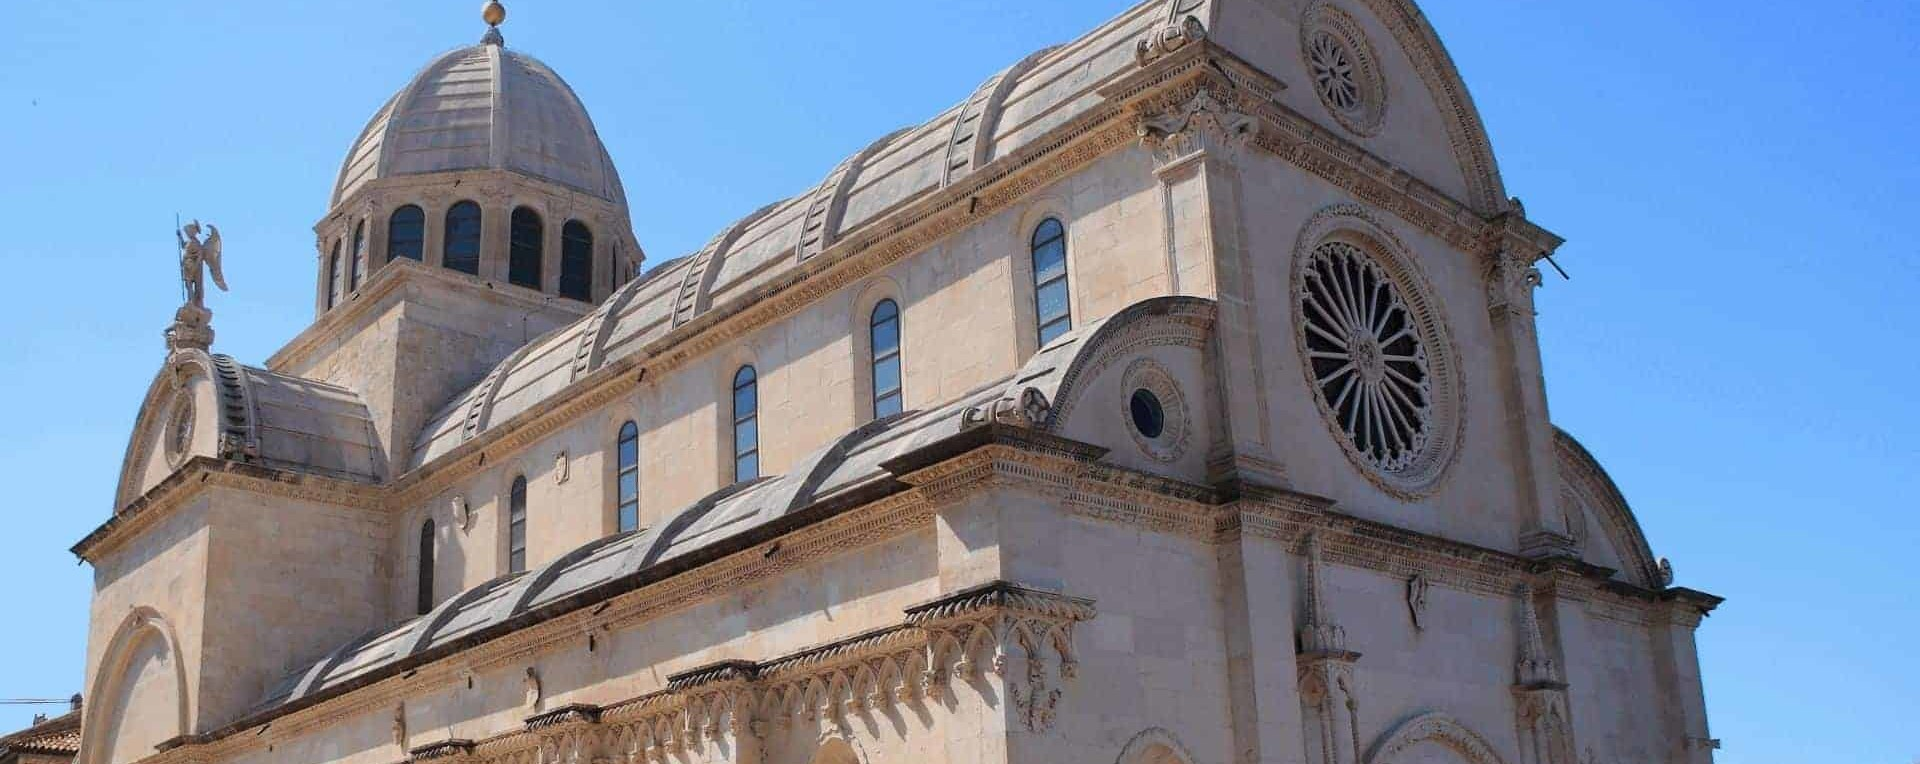 St James Cathedral in Šibenik, UNESCO Heritage